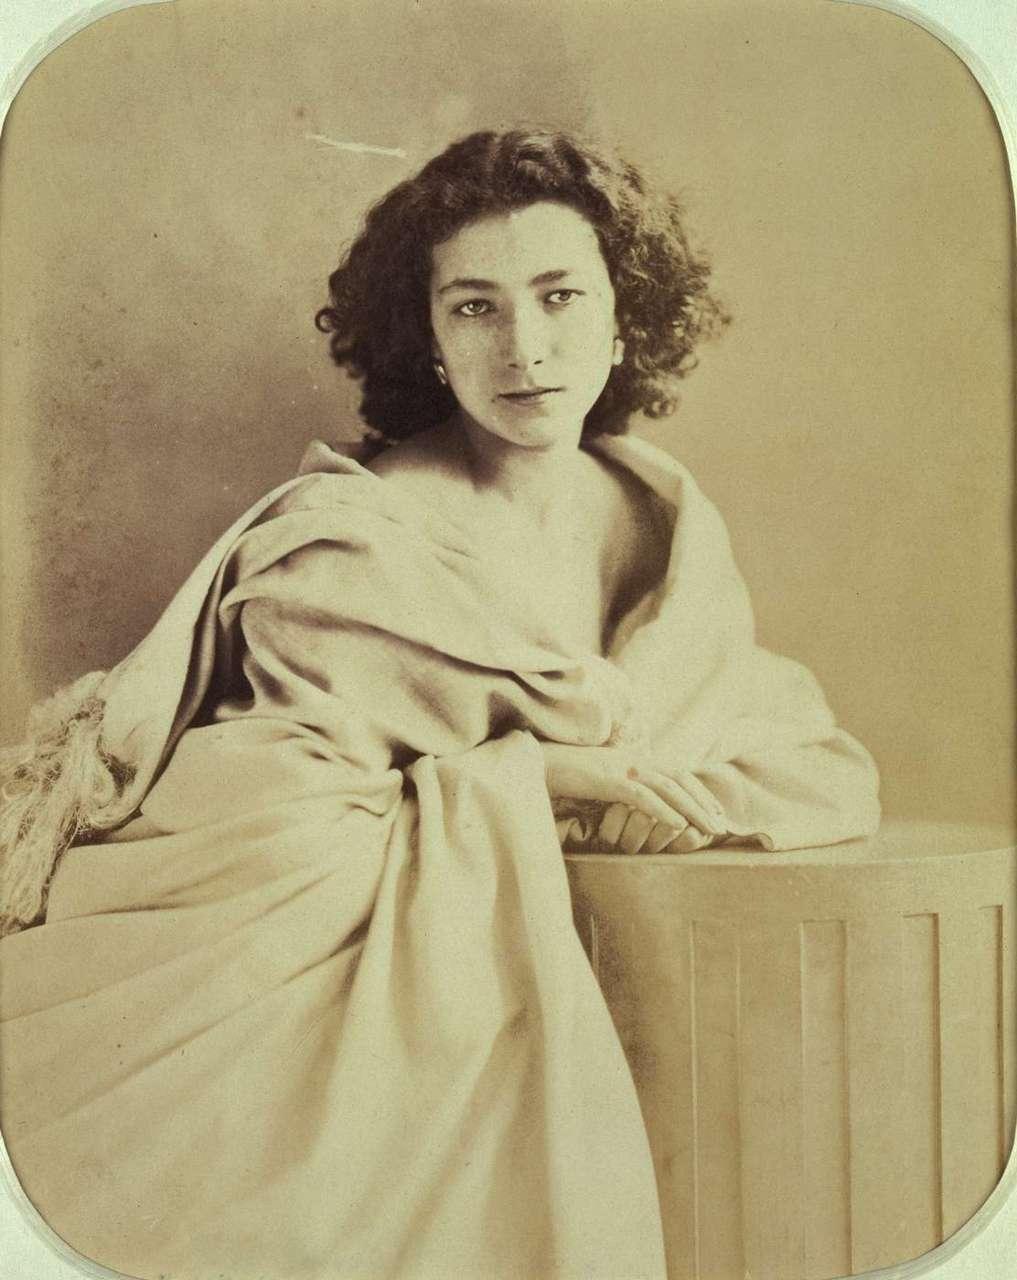 Vintage Photography Sarah Bernhardt